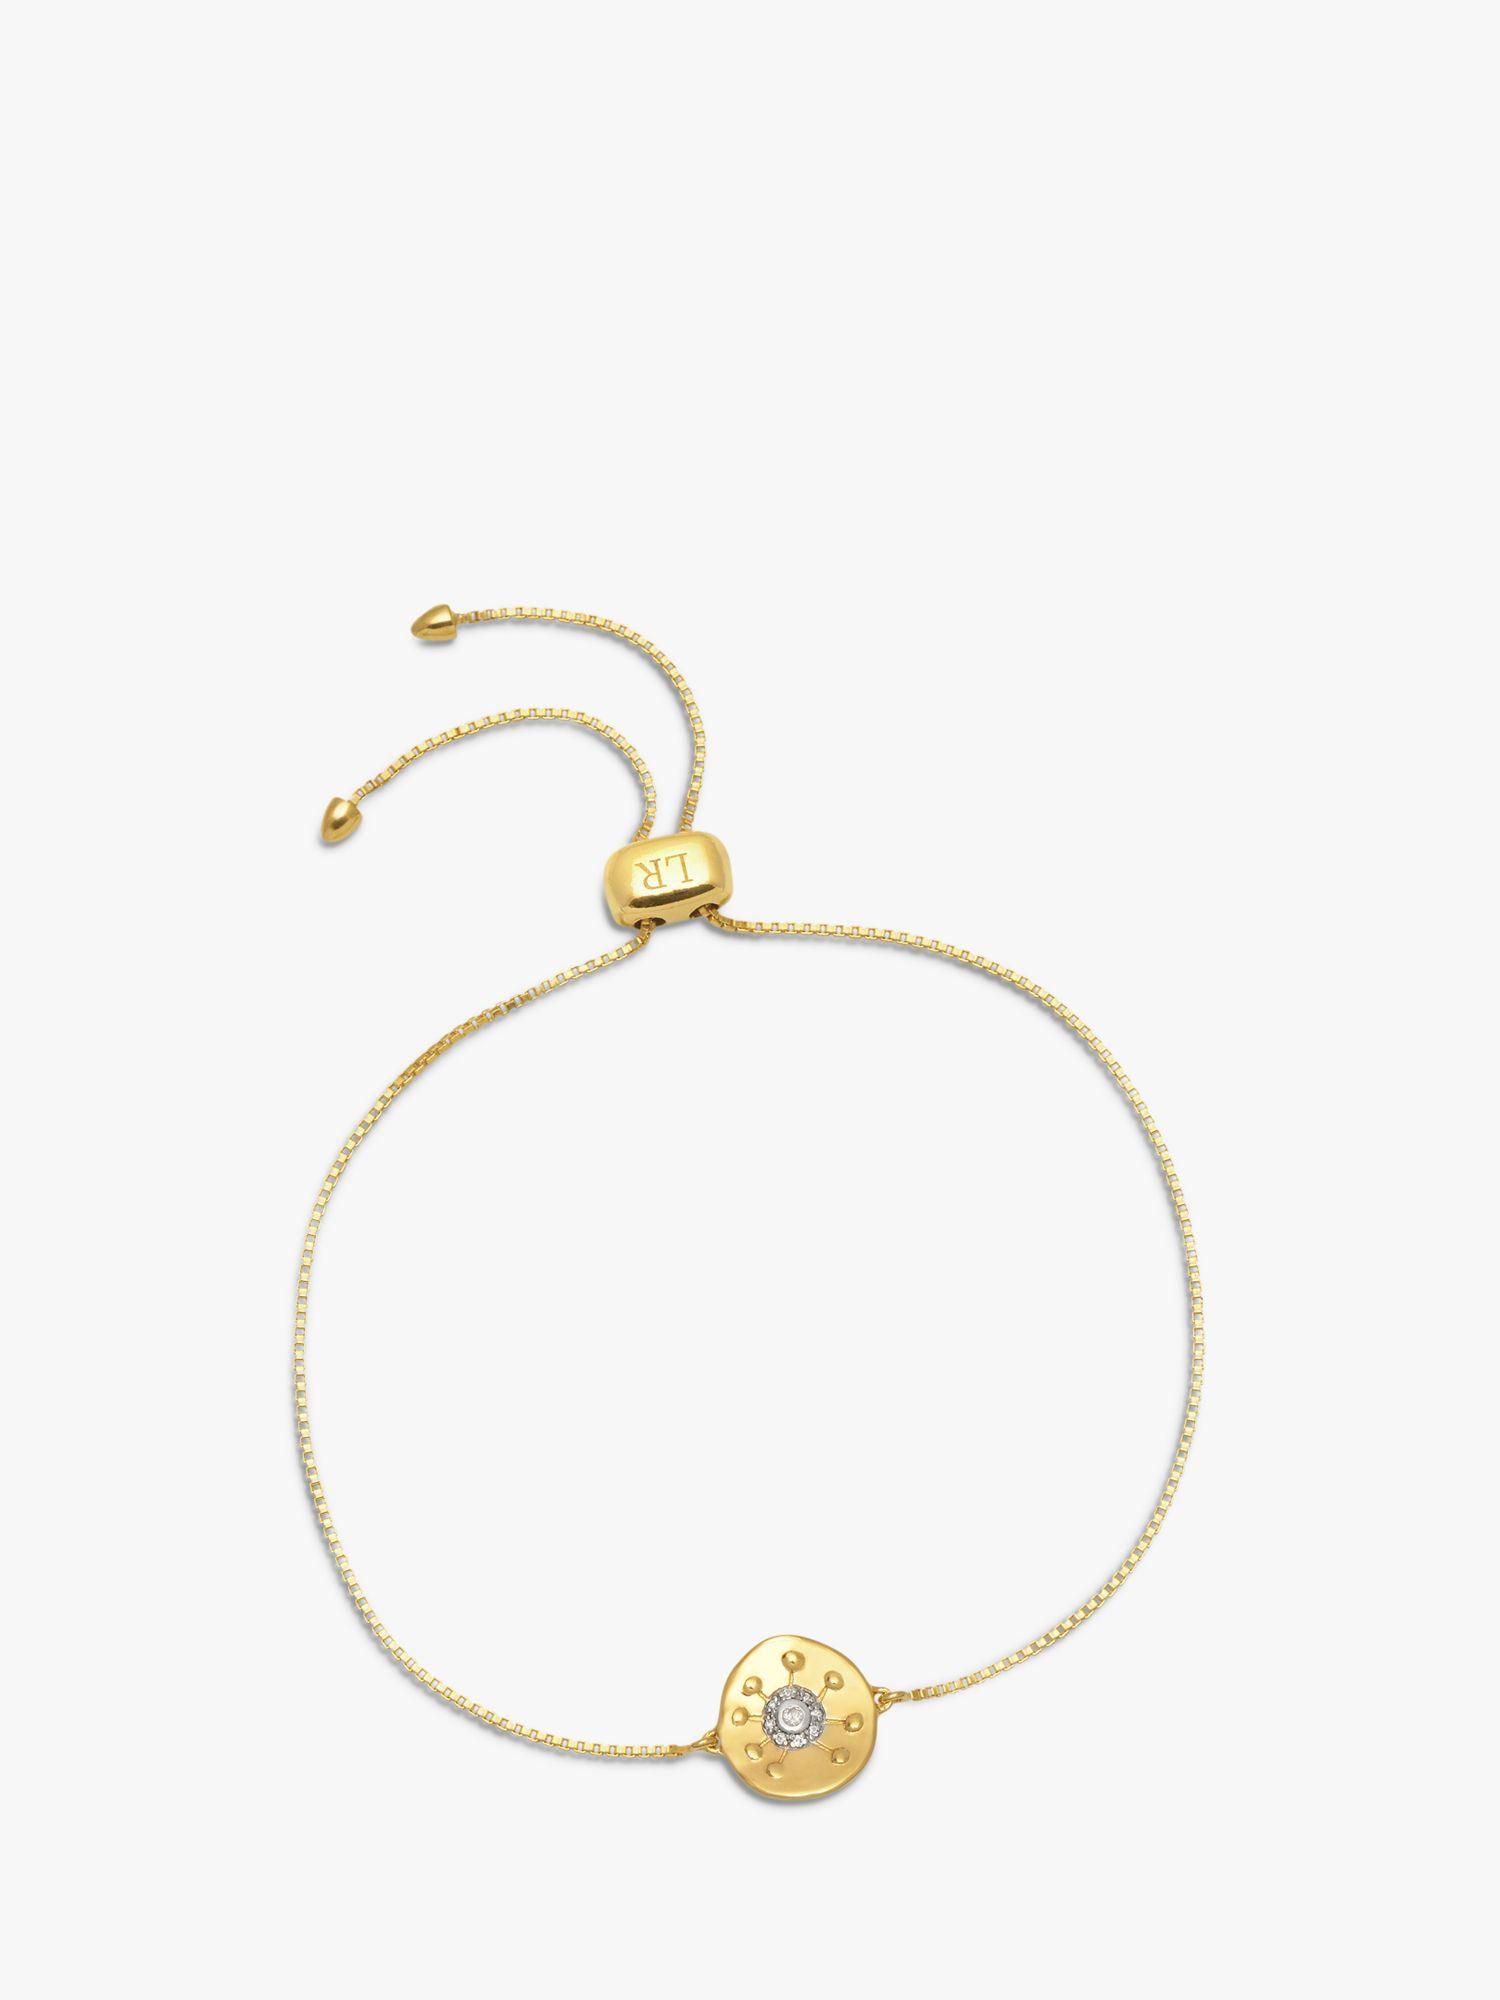 Lola Rose Lola Rose Curio Zircon Sun Coin Slider Chain Bracelet, Gold